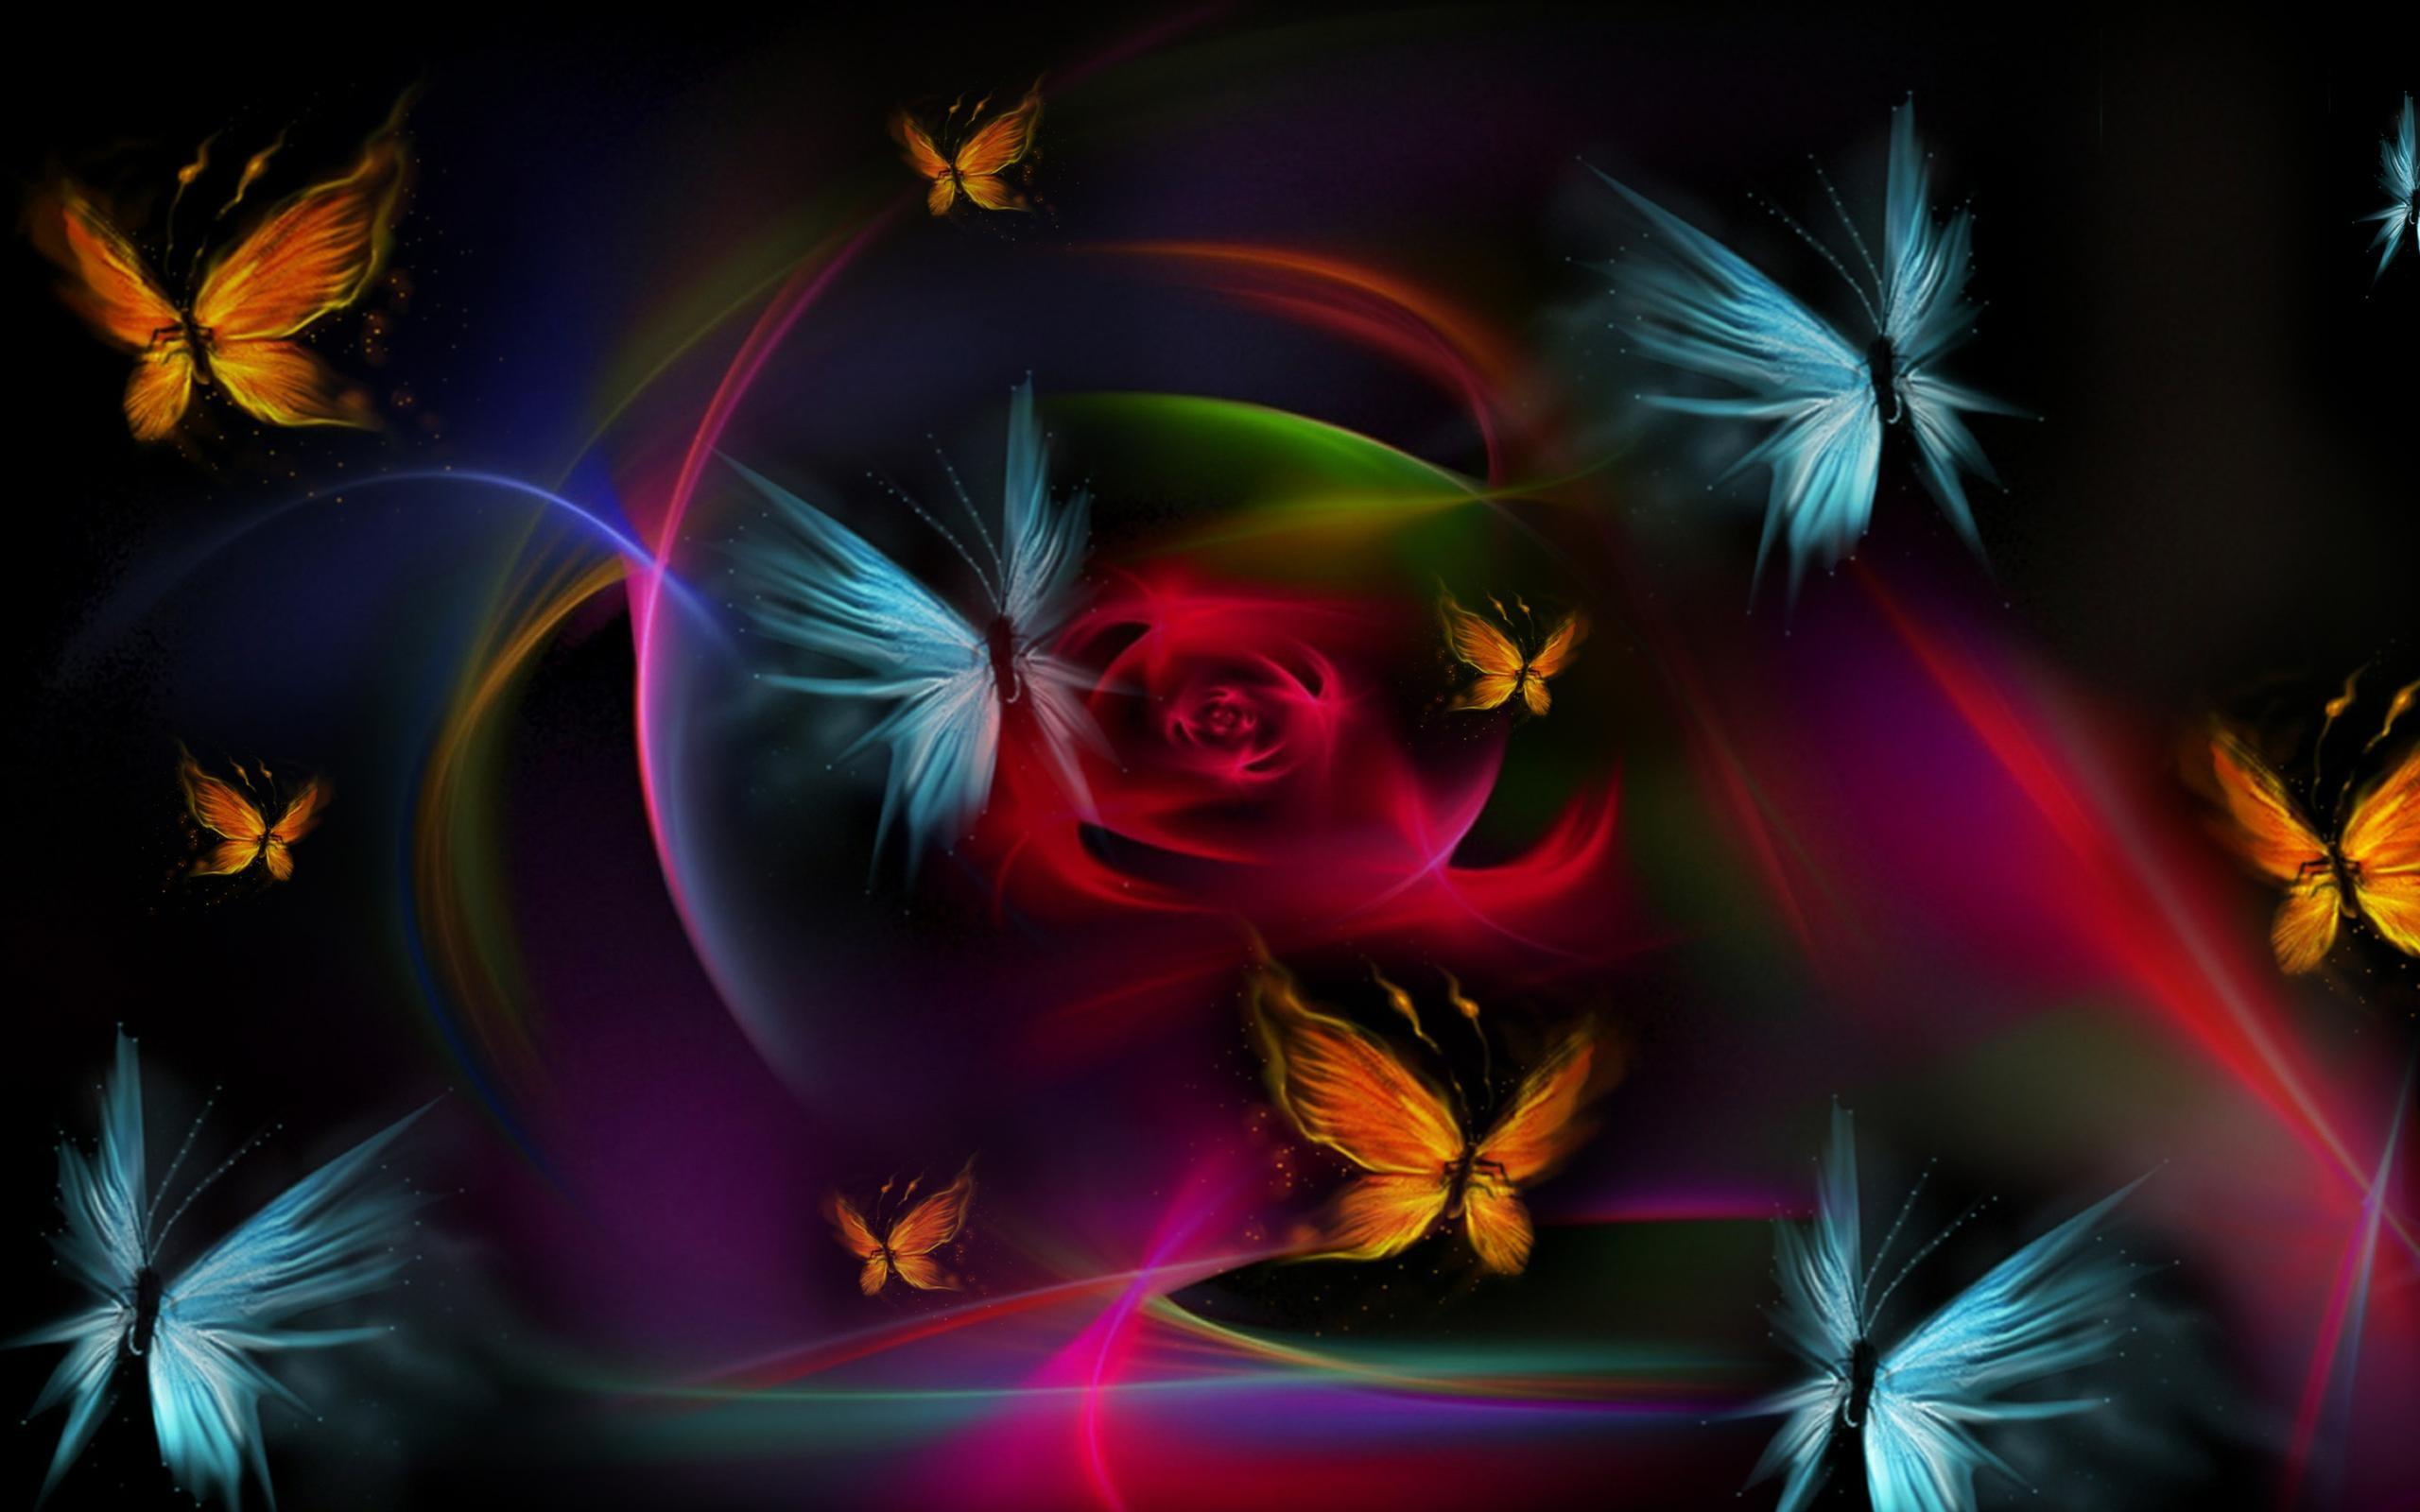 Butterflies Wallpaper Download Free Cool Full Hd Wallpapers